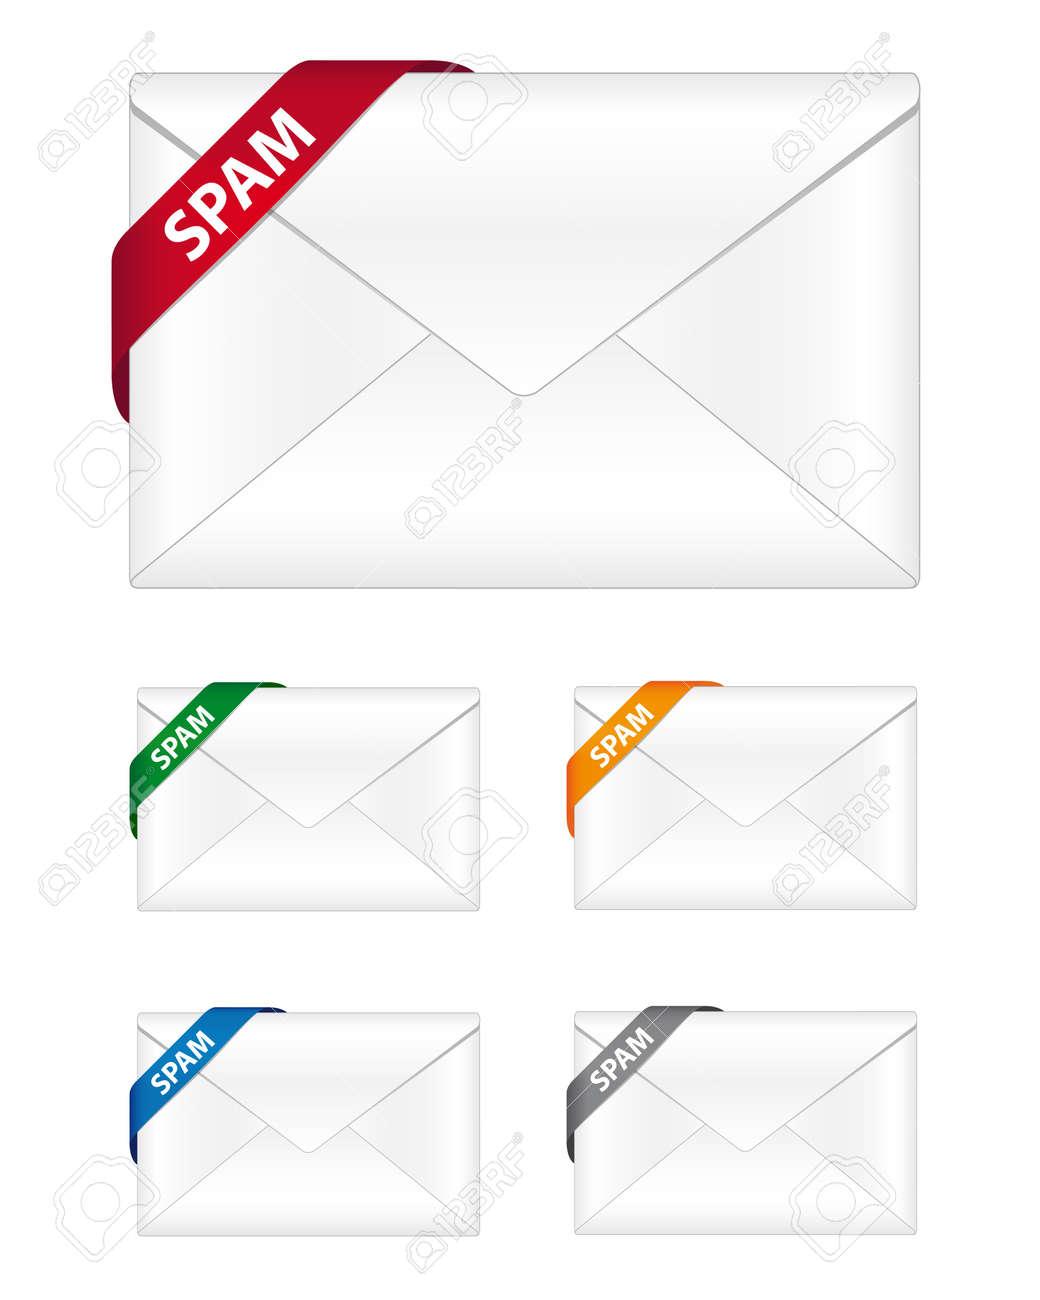 Spam newsletter icons Stock Vector - 10516693